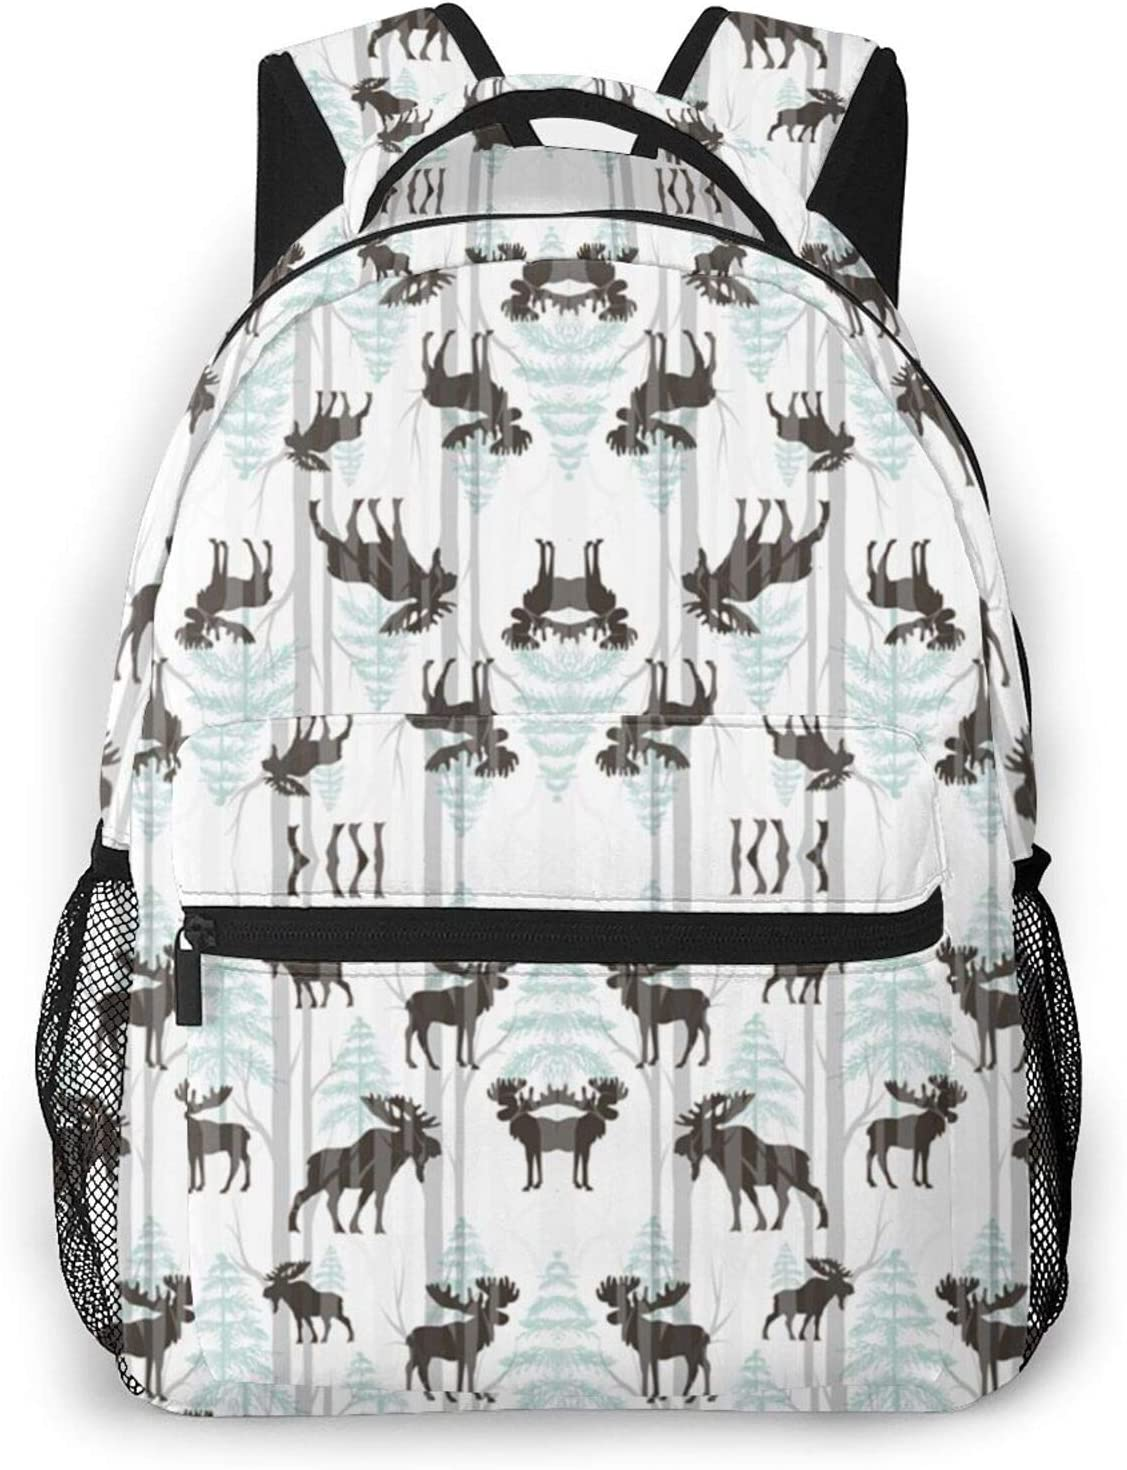 Many popular brands YOUNG H0ME Lightweight Polyester Travelin Forest Rucksacks Moose Sale item